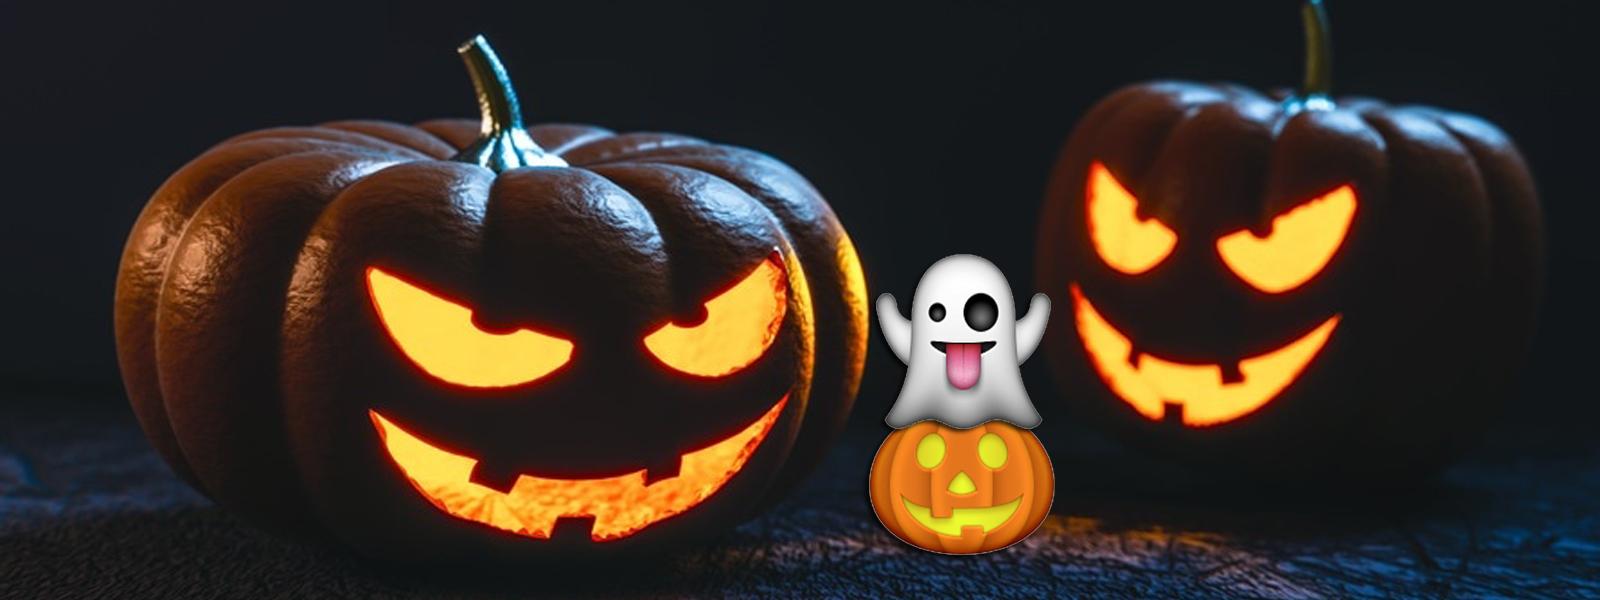 halloween-puns